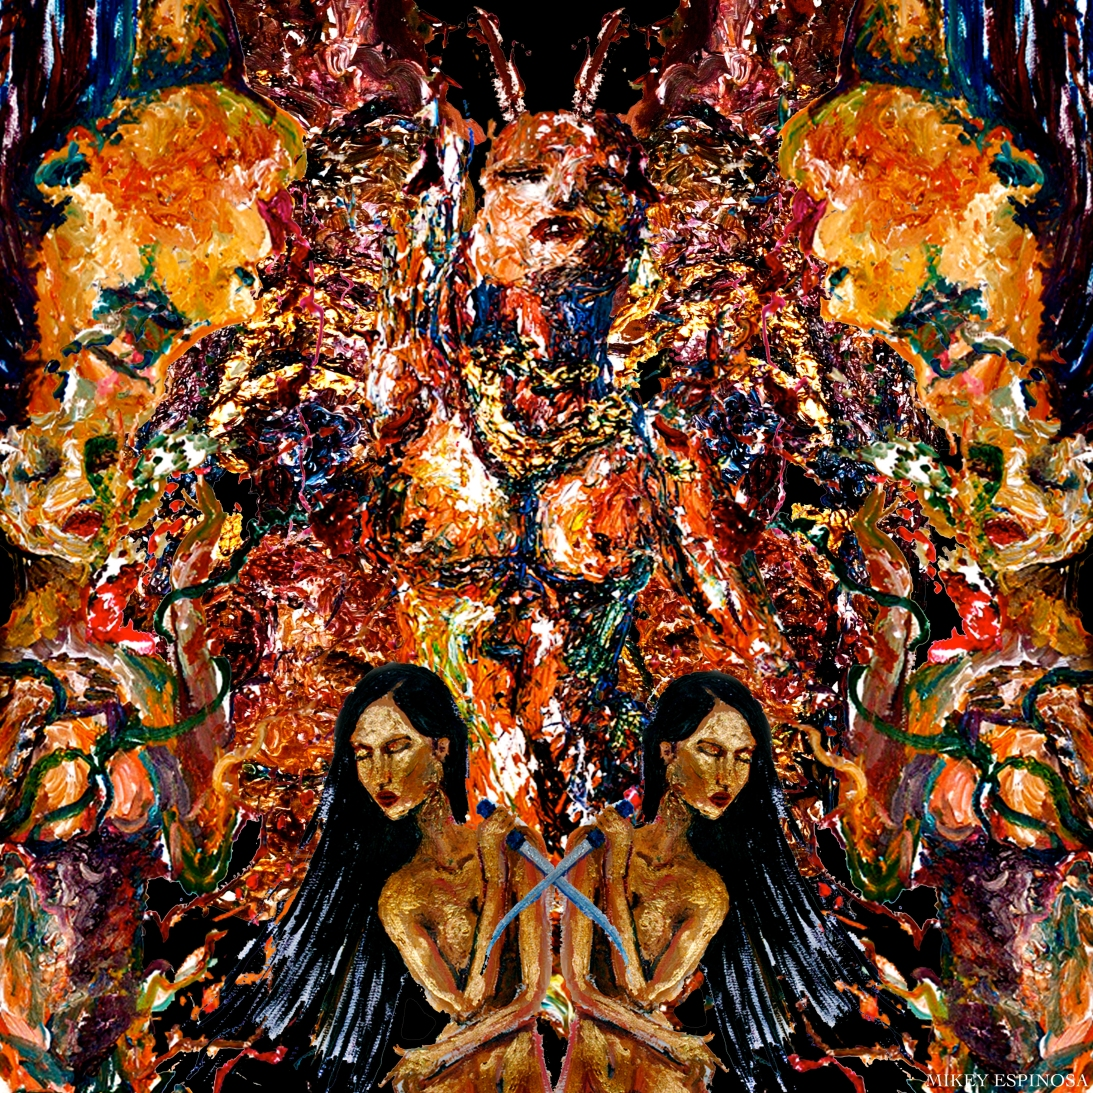 Mikey Espinosa - Empress mashed